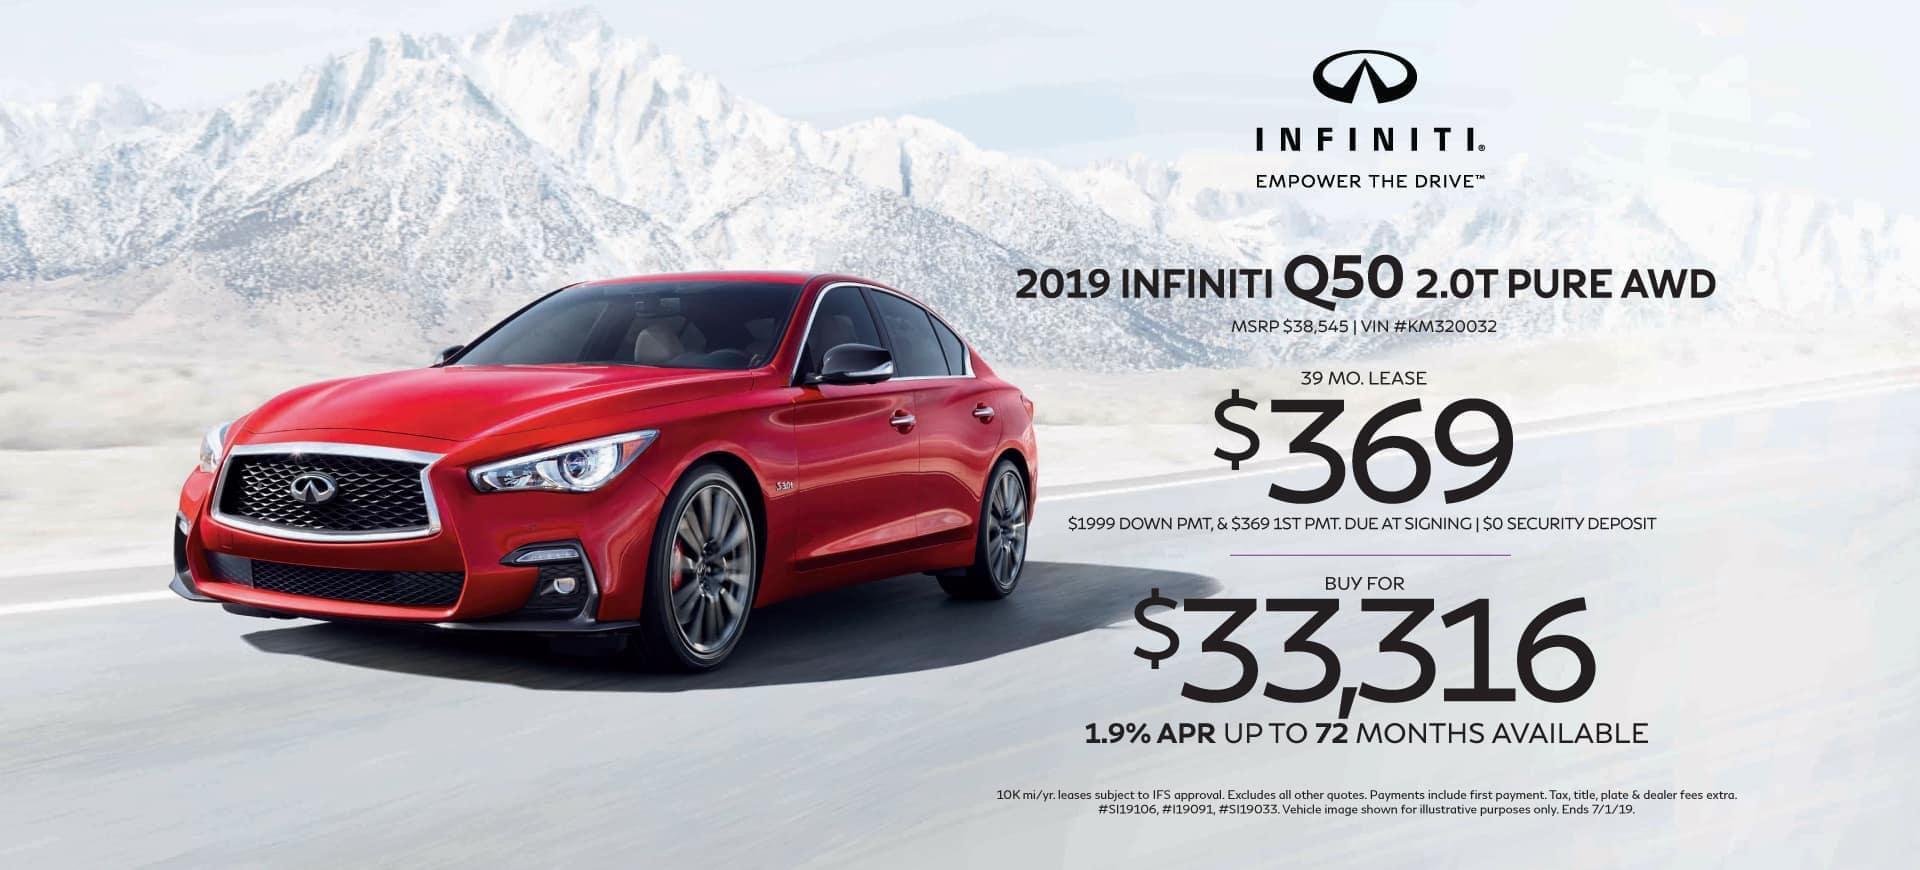 New 2019 INFINITI Q50 Header